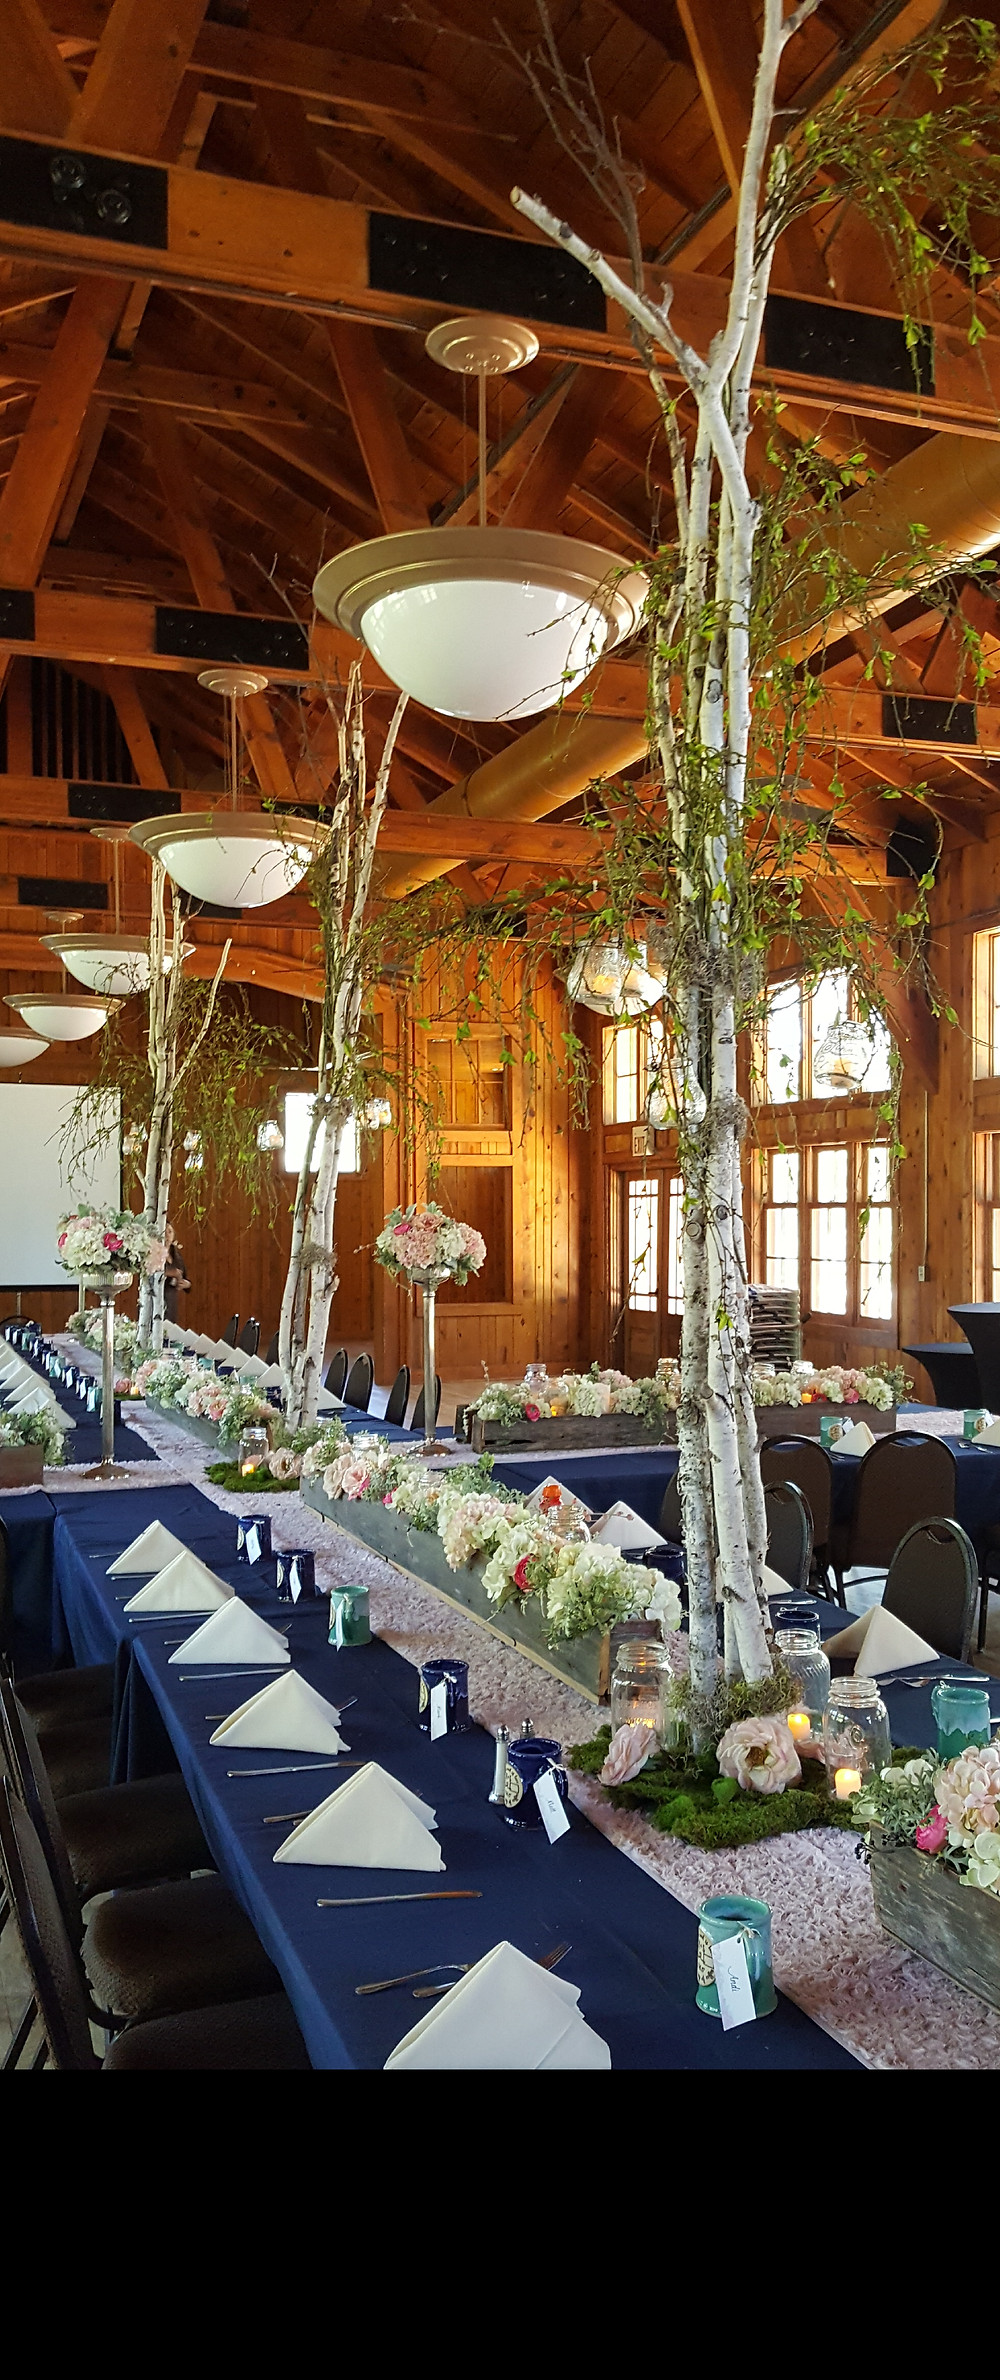 custer state park wedding sylvan lodge